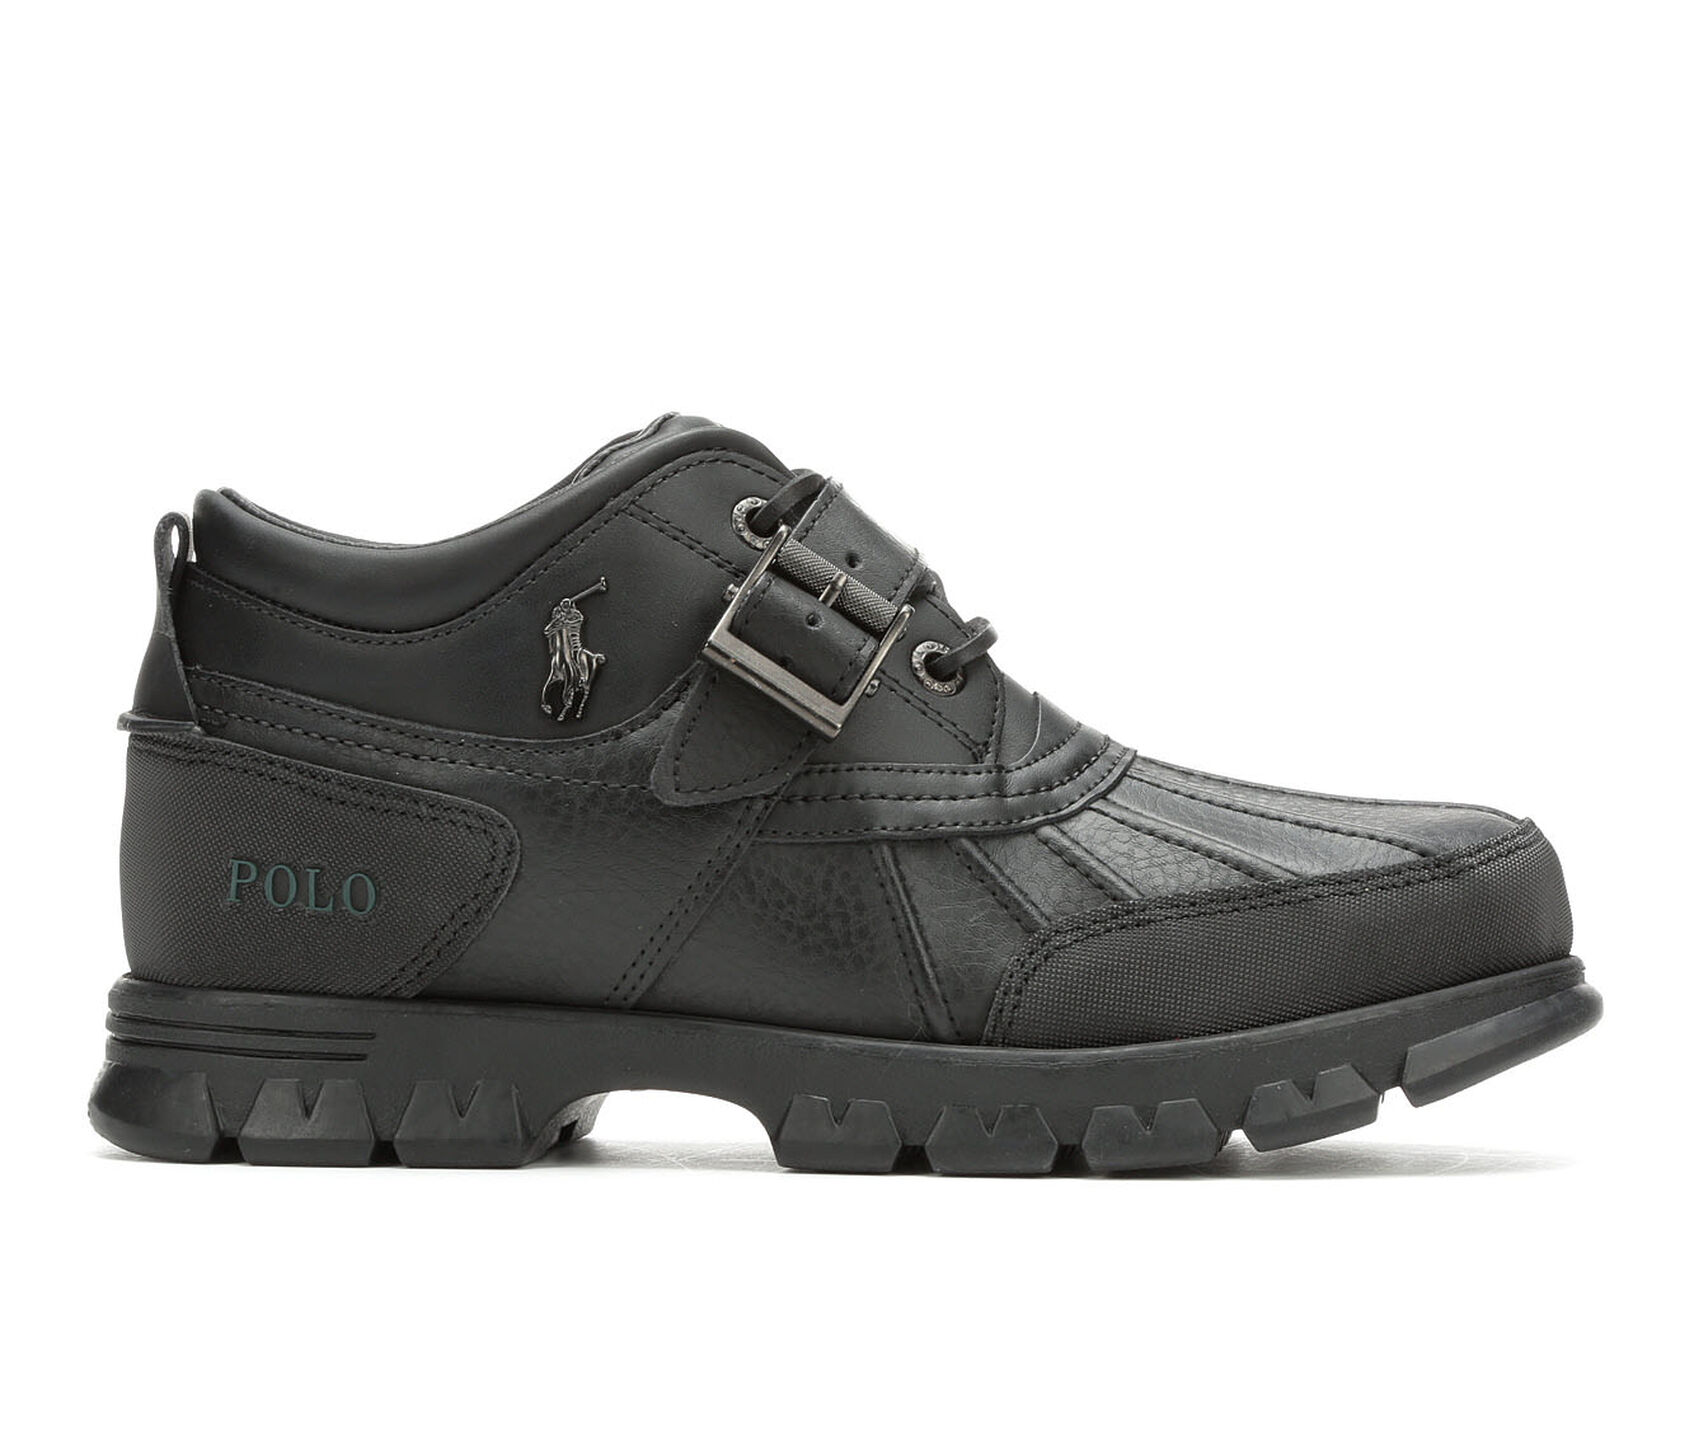 dba0eb8039 Men's Polo Dover III Casual Boots | Shoe Carnival